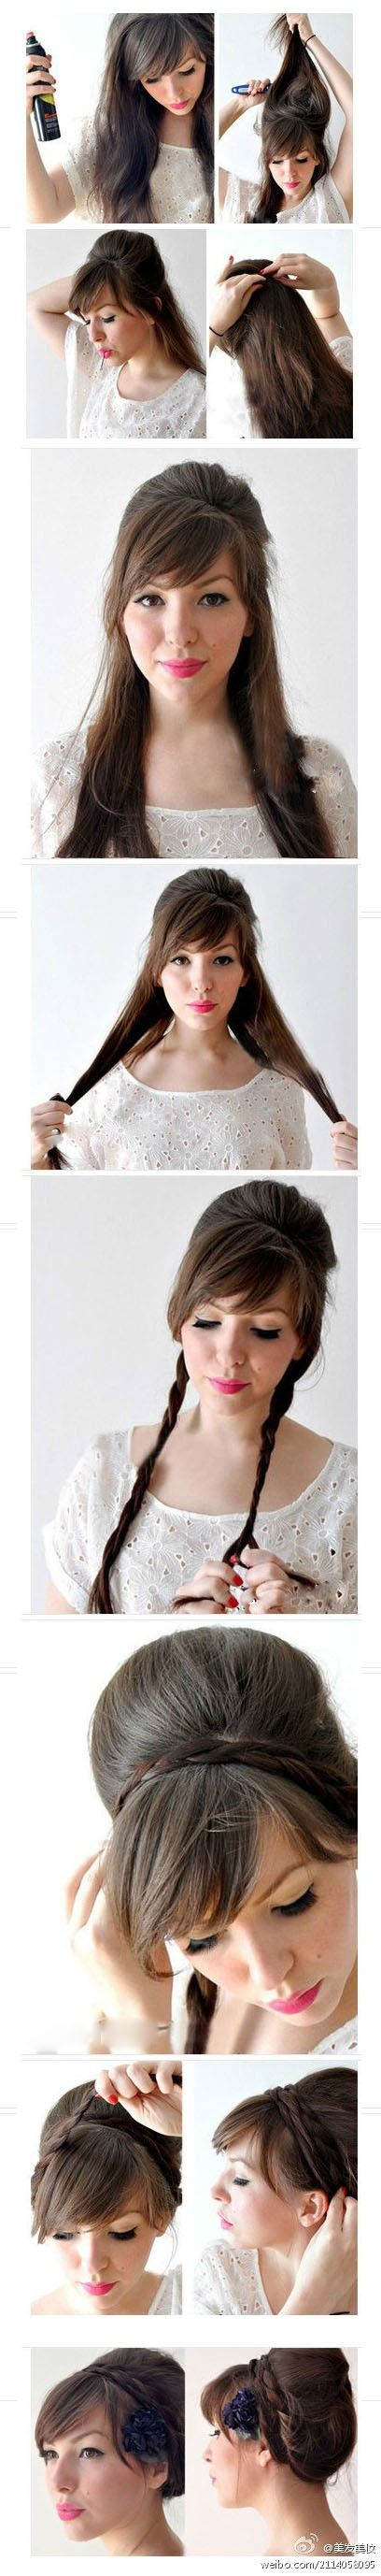 Super cute hair pinterest braid hairstyles updo and classy